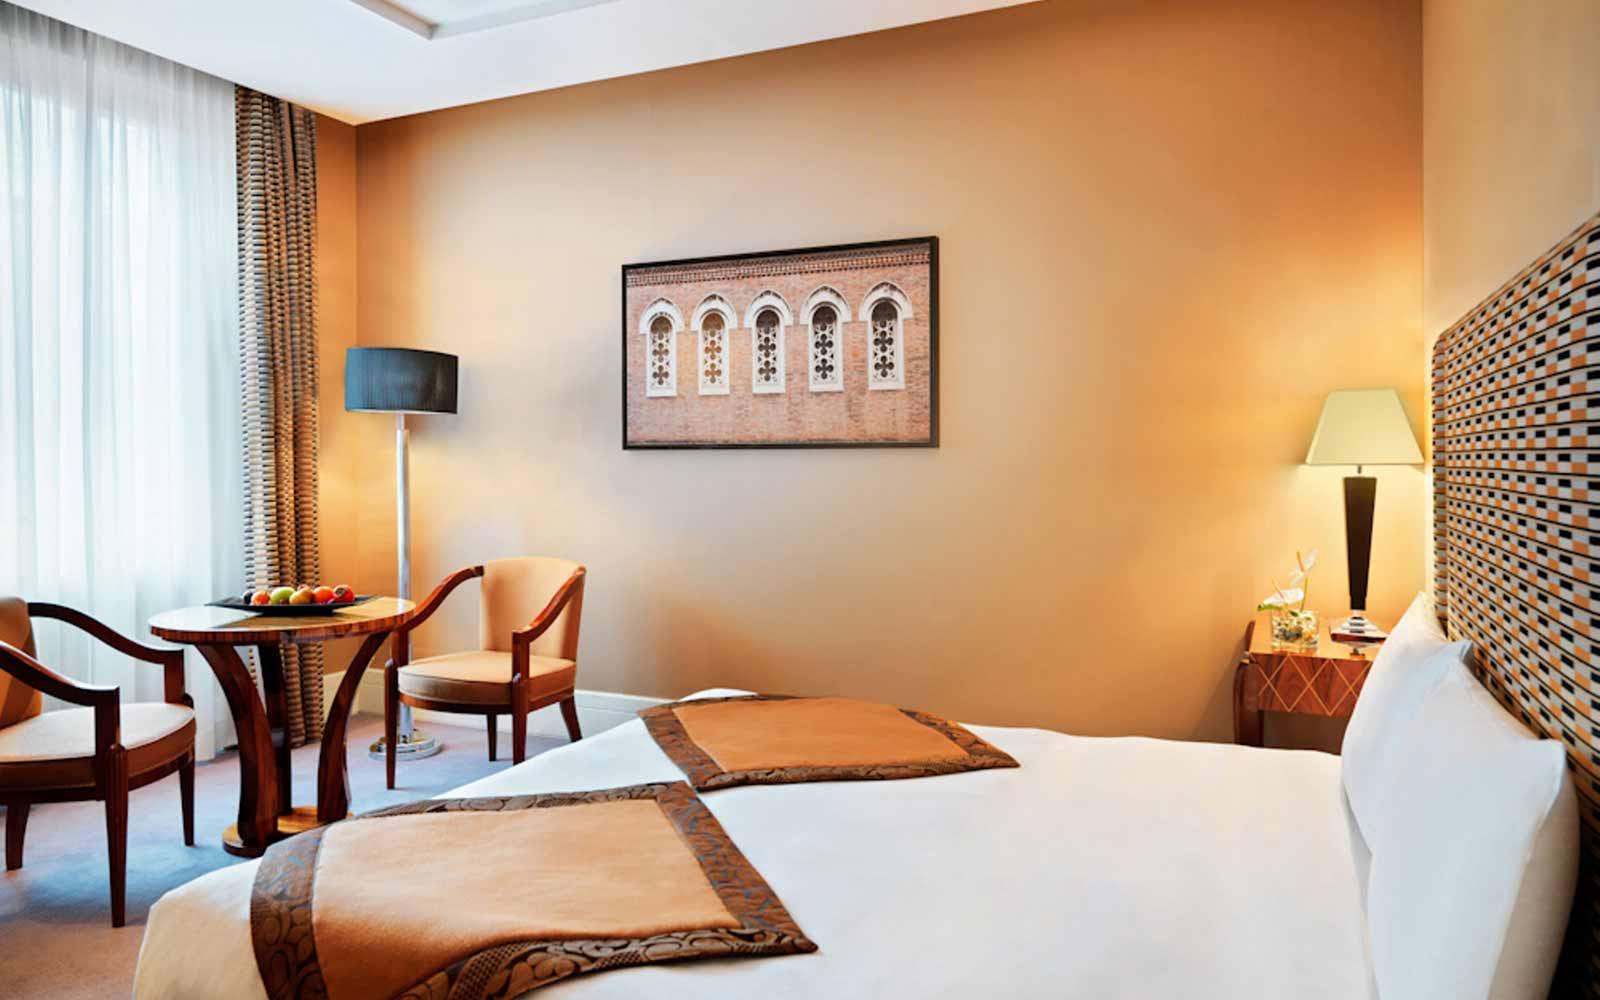 Superior room at the Grand Hotel Via Veneto